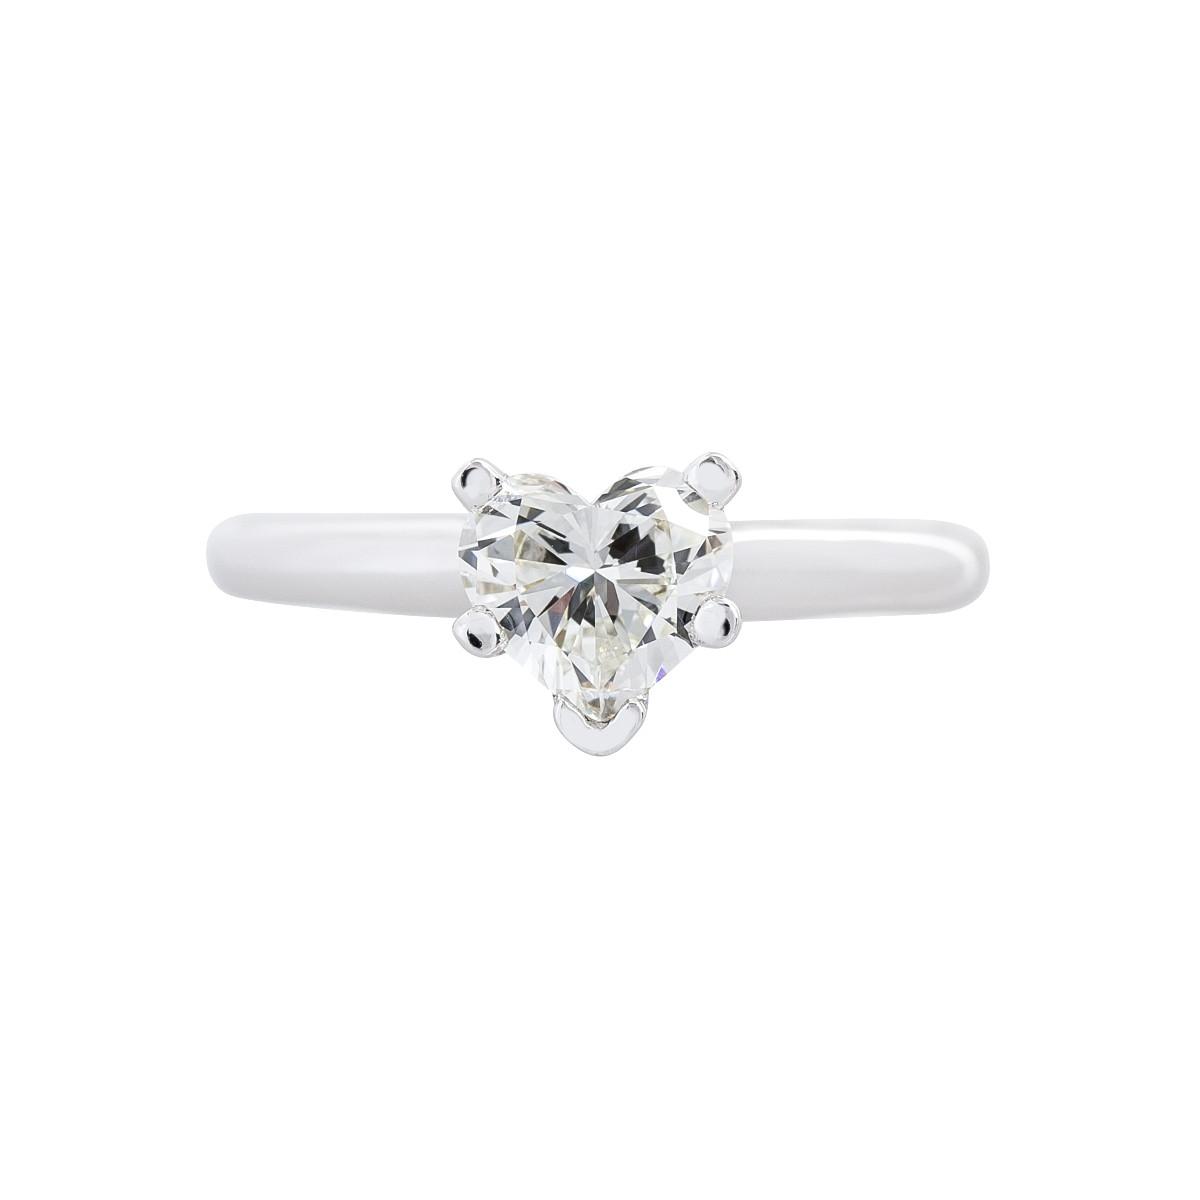 Vintage 0.63 CT Diamond Engagement Ring